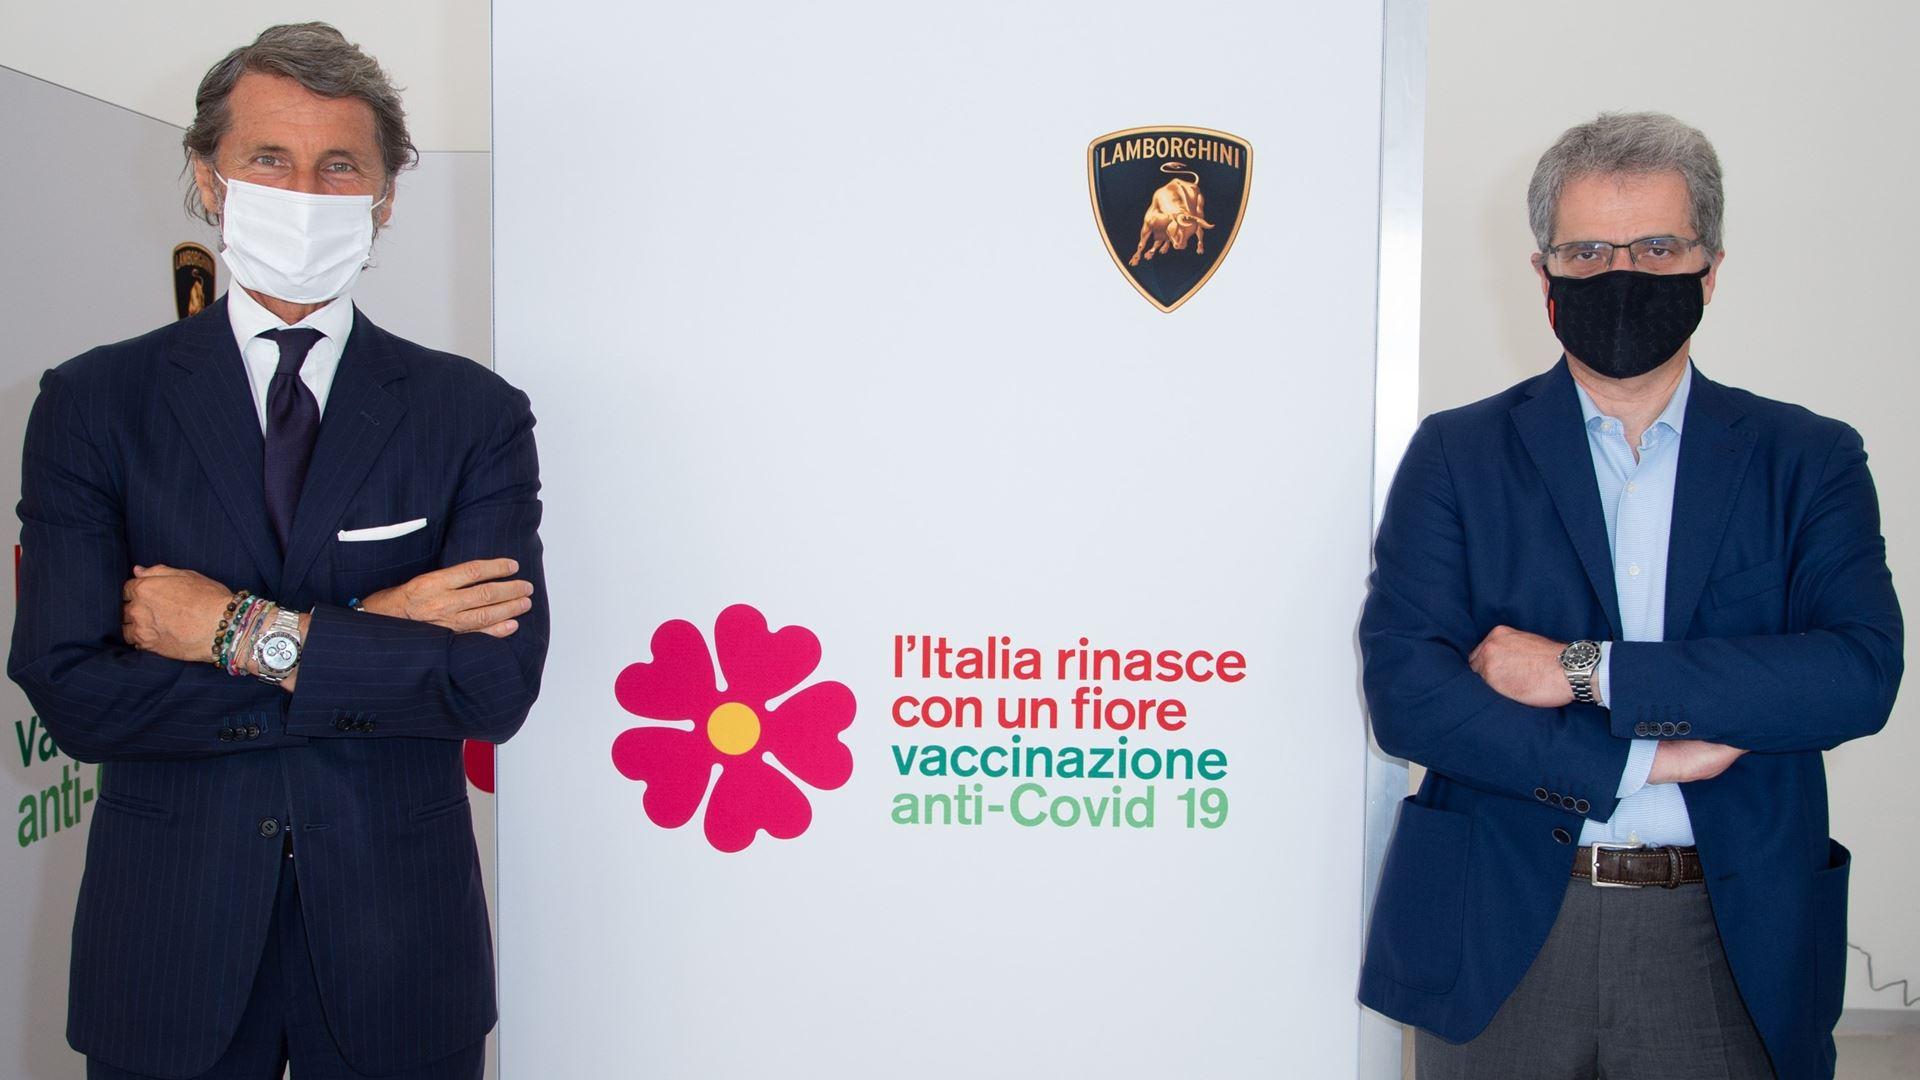 Automobili Lamborghini opens the company vaccination centre - All employees vaccinated in three day - Image 1